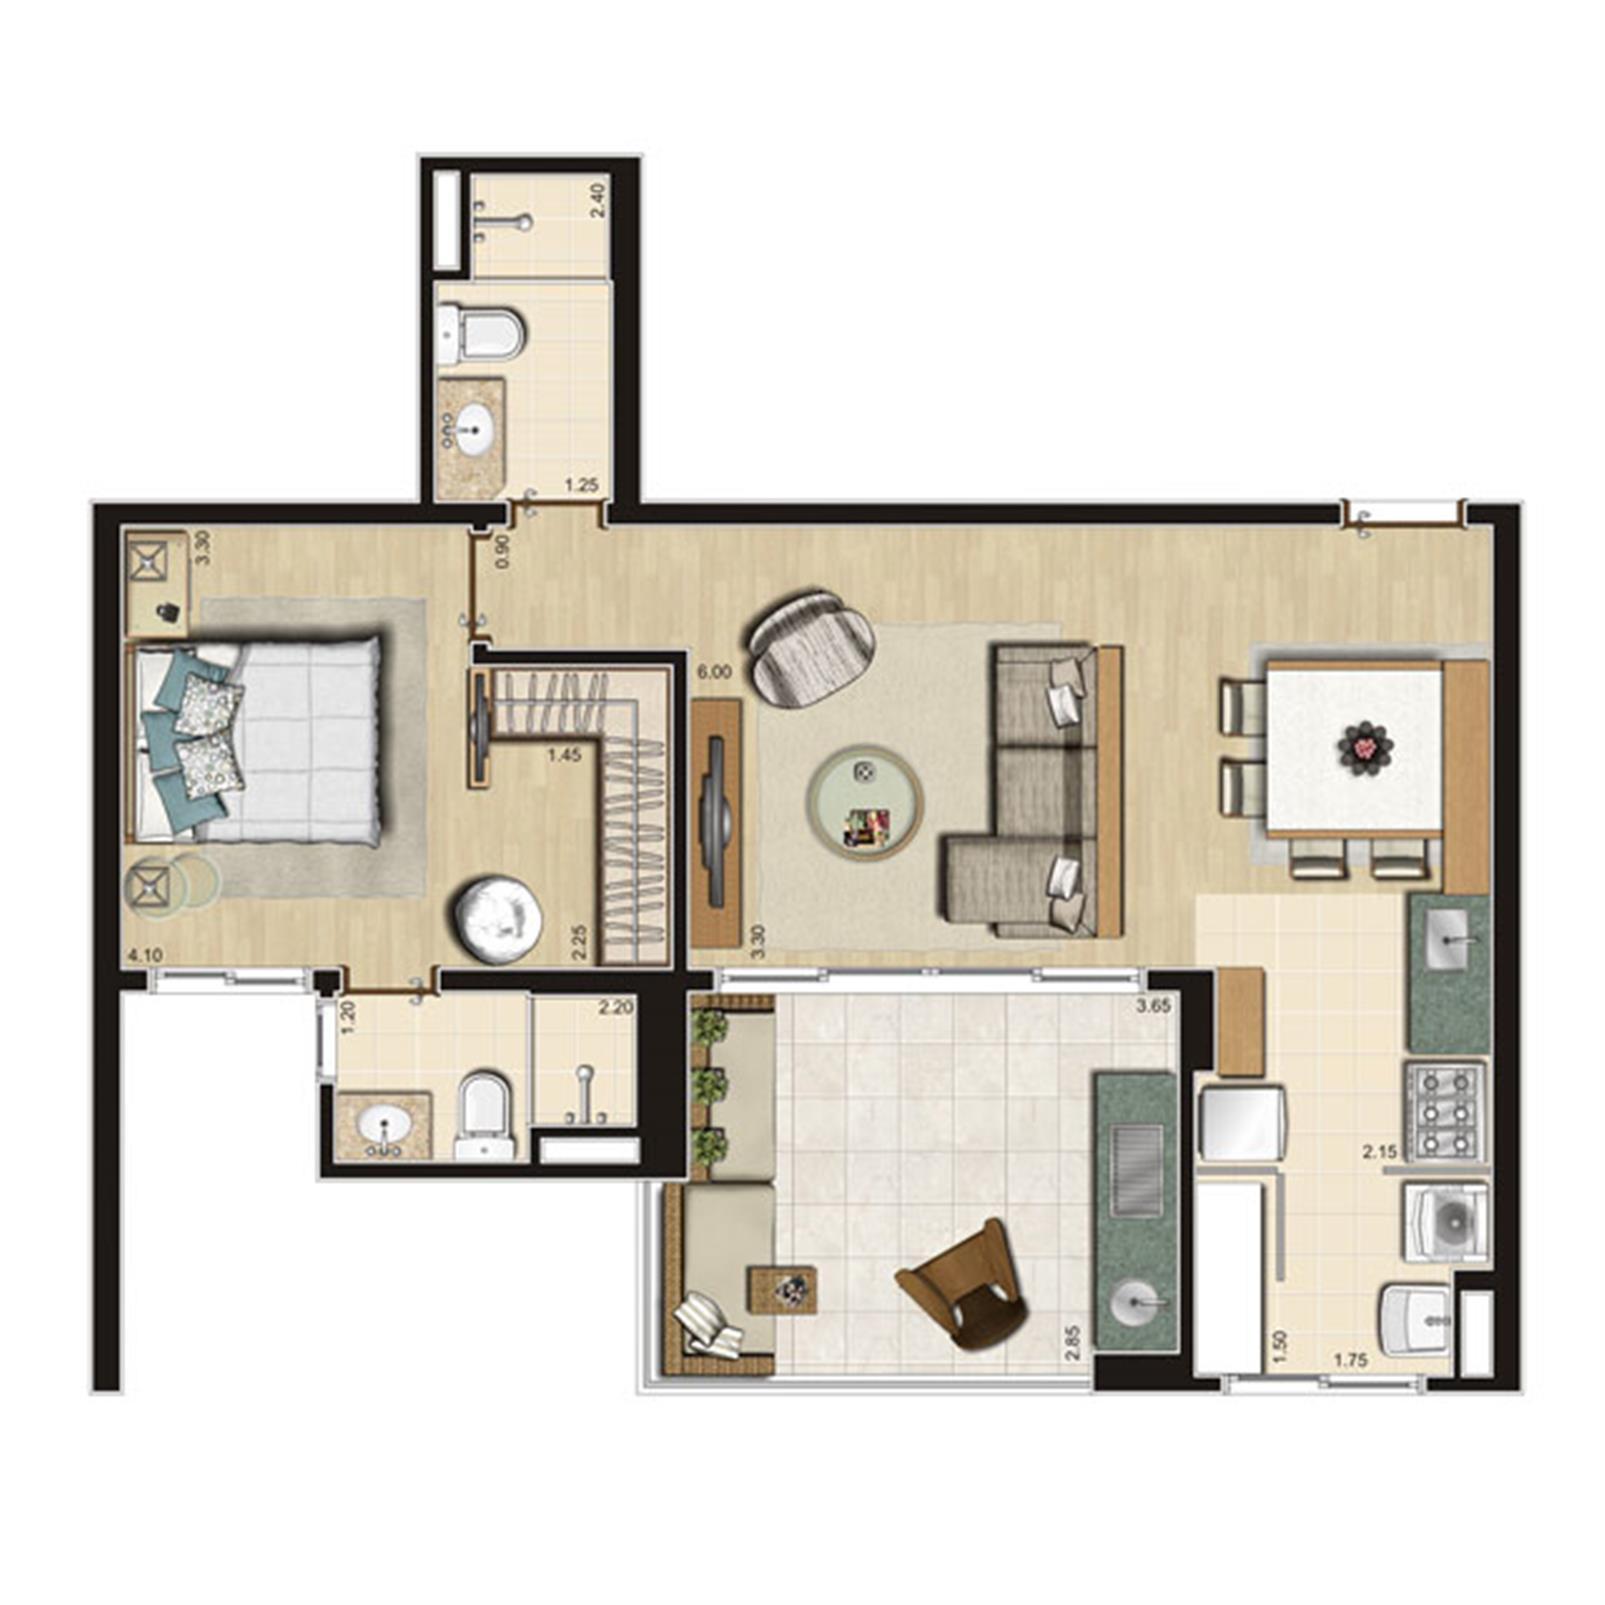 Planta Opção 66m² privativos | Thera Residence – Apartamentona  Berrini - São Paulo - São Paulo